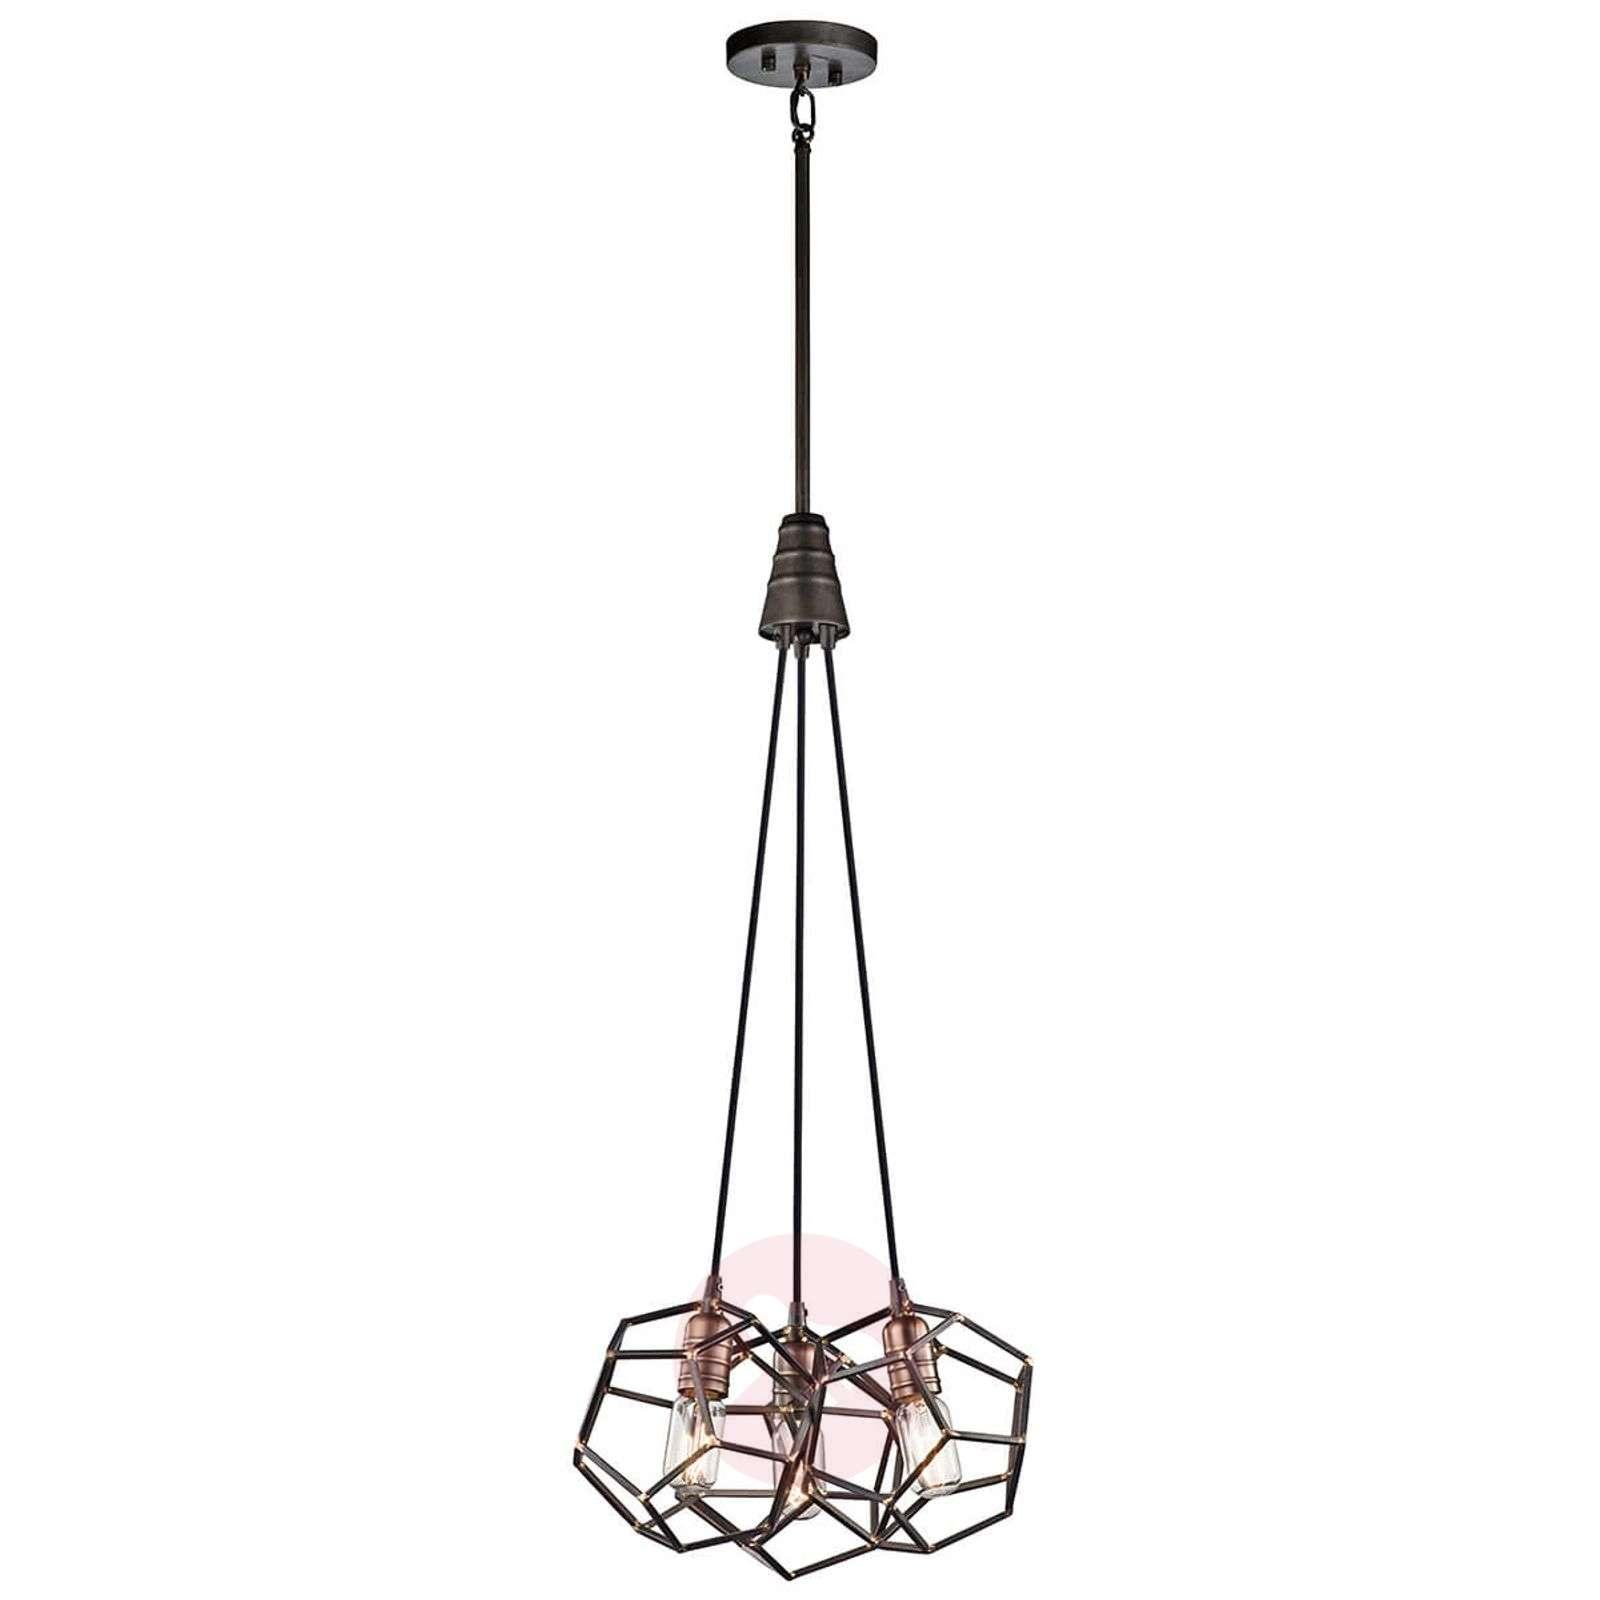 Pendant light Rocklyn three-bulb-3048728-01